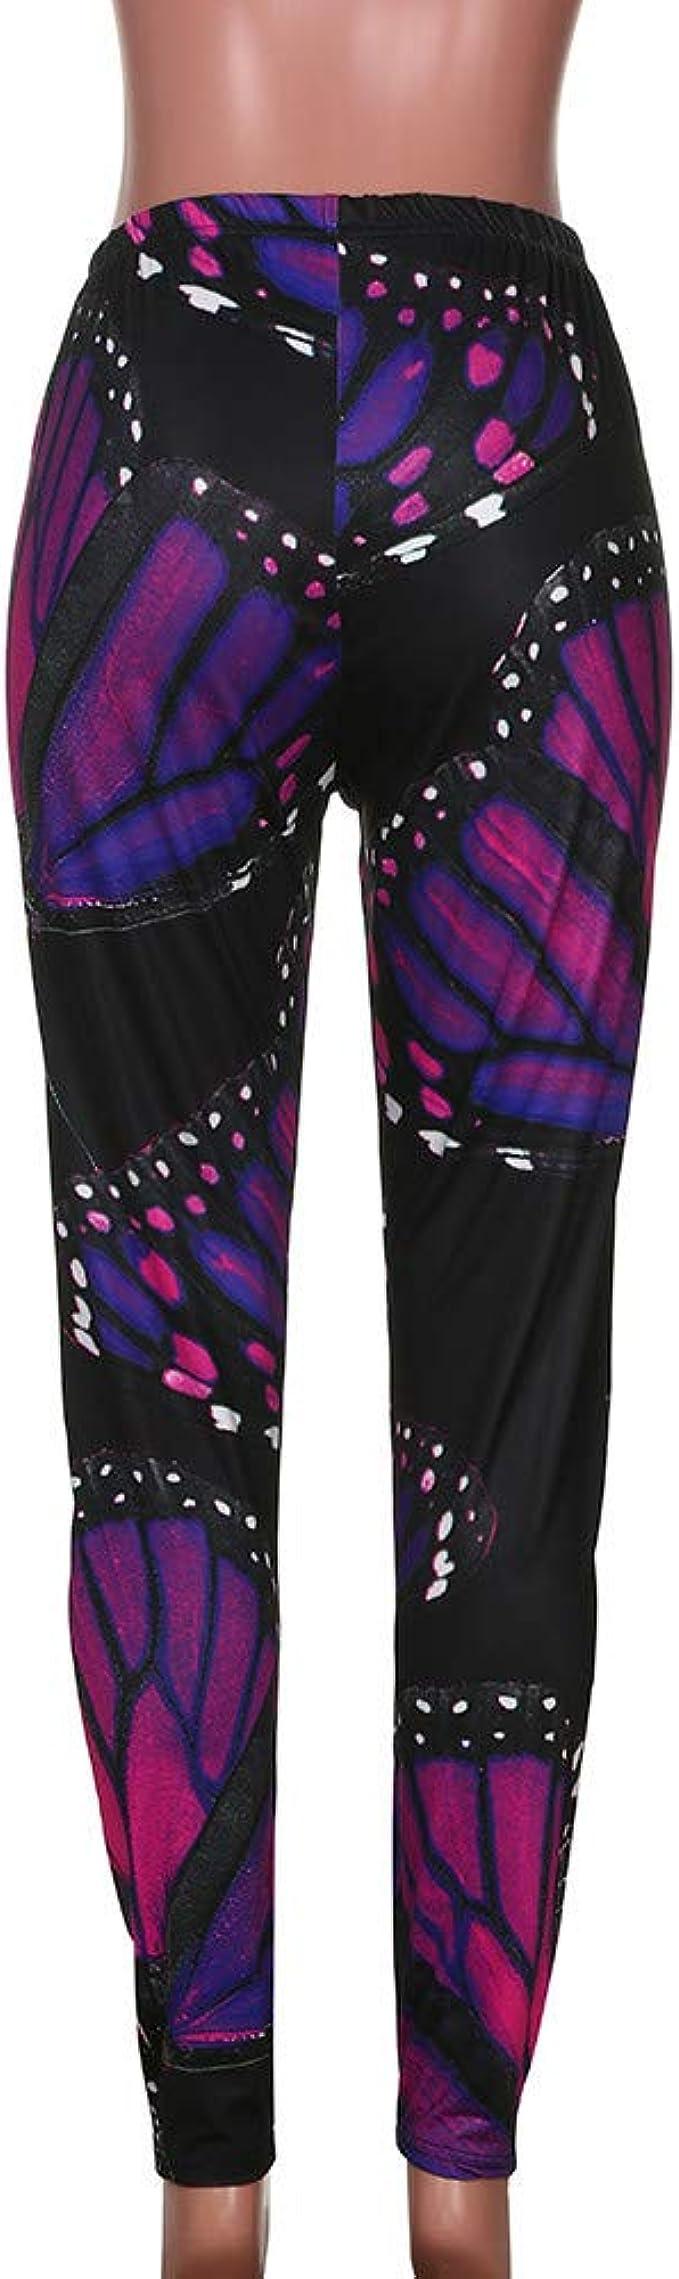 Amazon.com: UROSA - Pantalones de yoga para mujer, talla ...